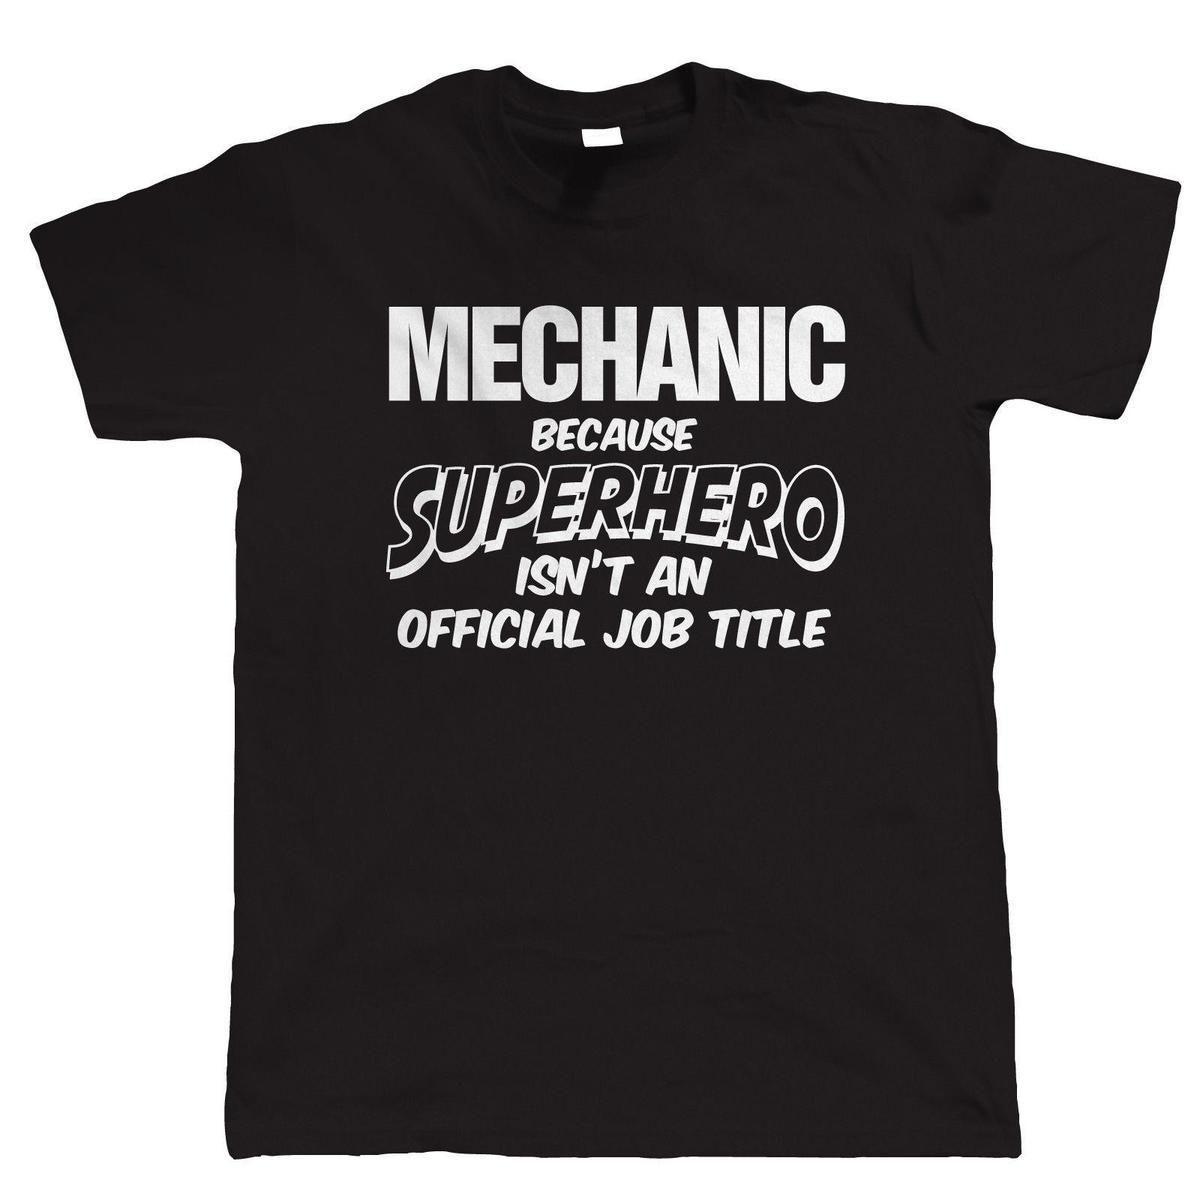 Mechanic Superhero Mens Funny T Shirt Gift For Dad Him Birthday Shirts Tshirt From Jie67 1467